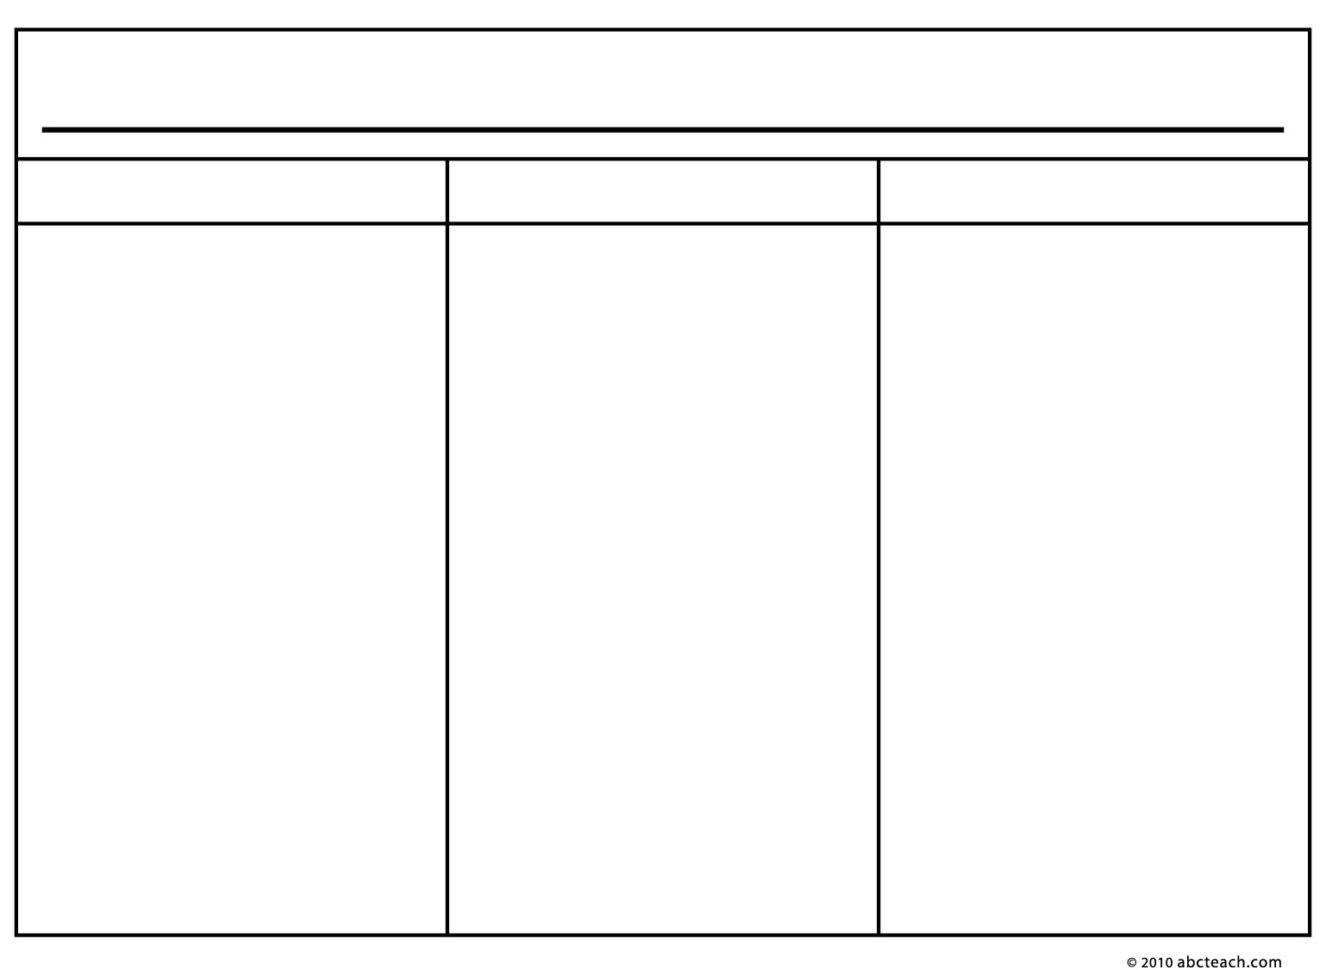 Printable 3 Column Spreadsheet Printable Spreadshee Printable 3 Column Spreadsheet